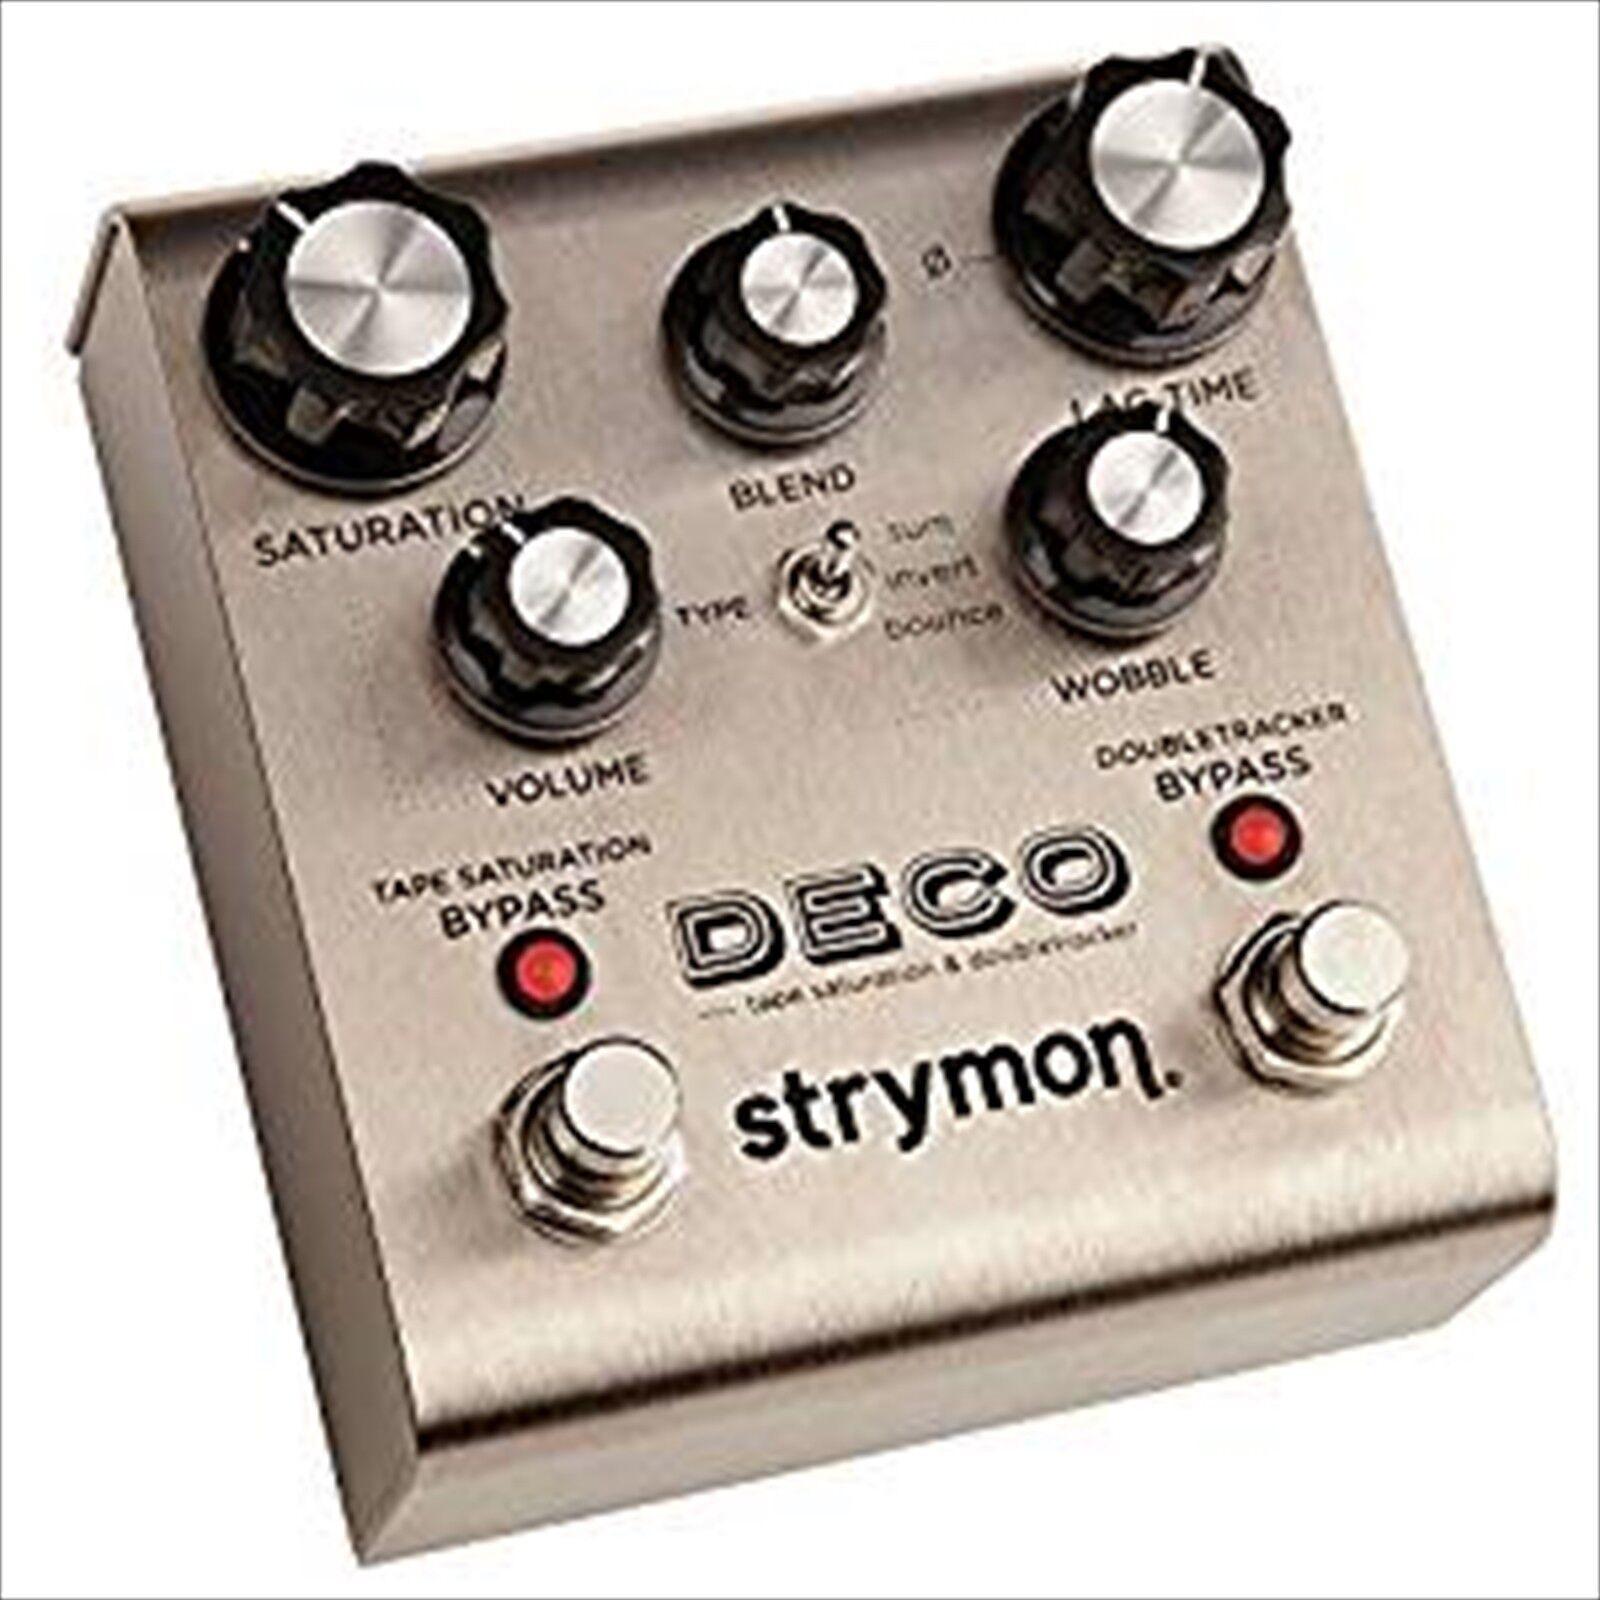 strymon DECO Tape Saturation & Doubletracker Guitar Effect Pedal Japan NEW